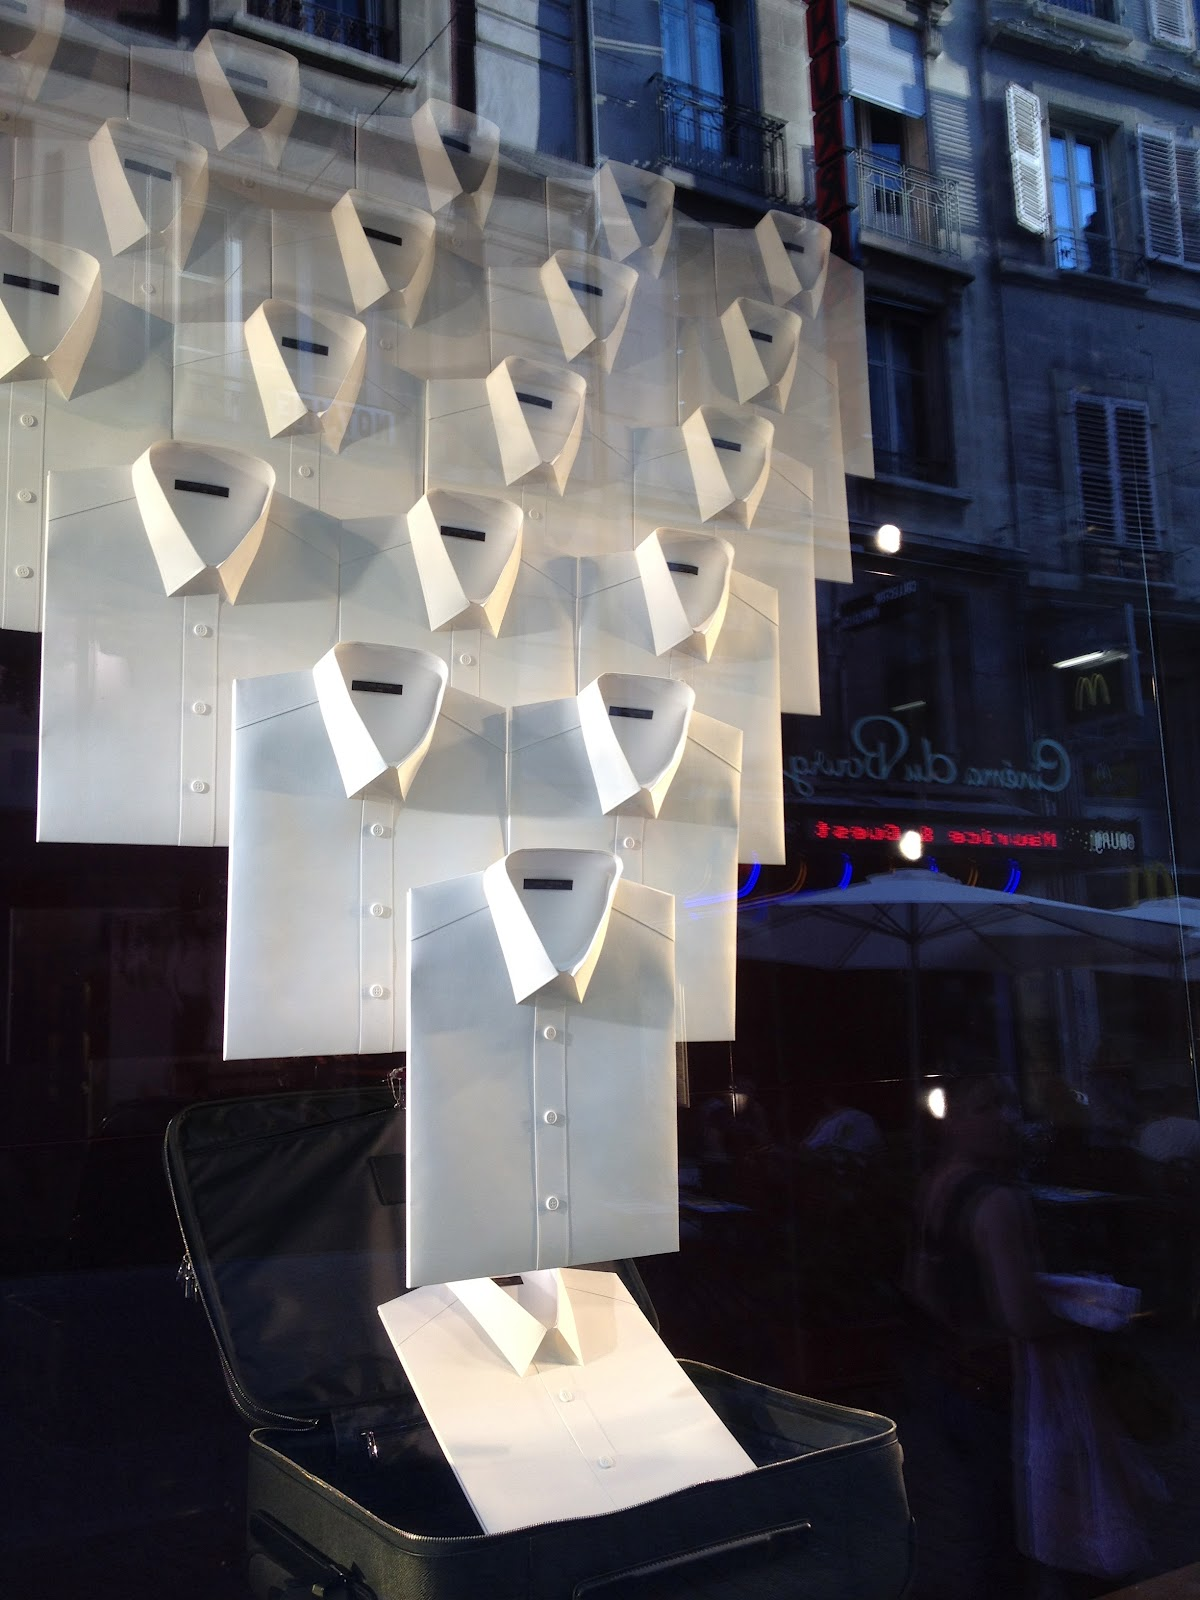 vitrines louis vuitton